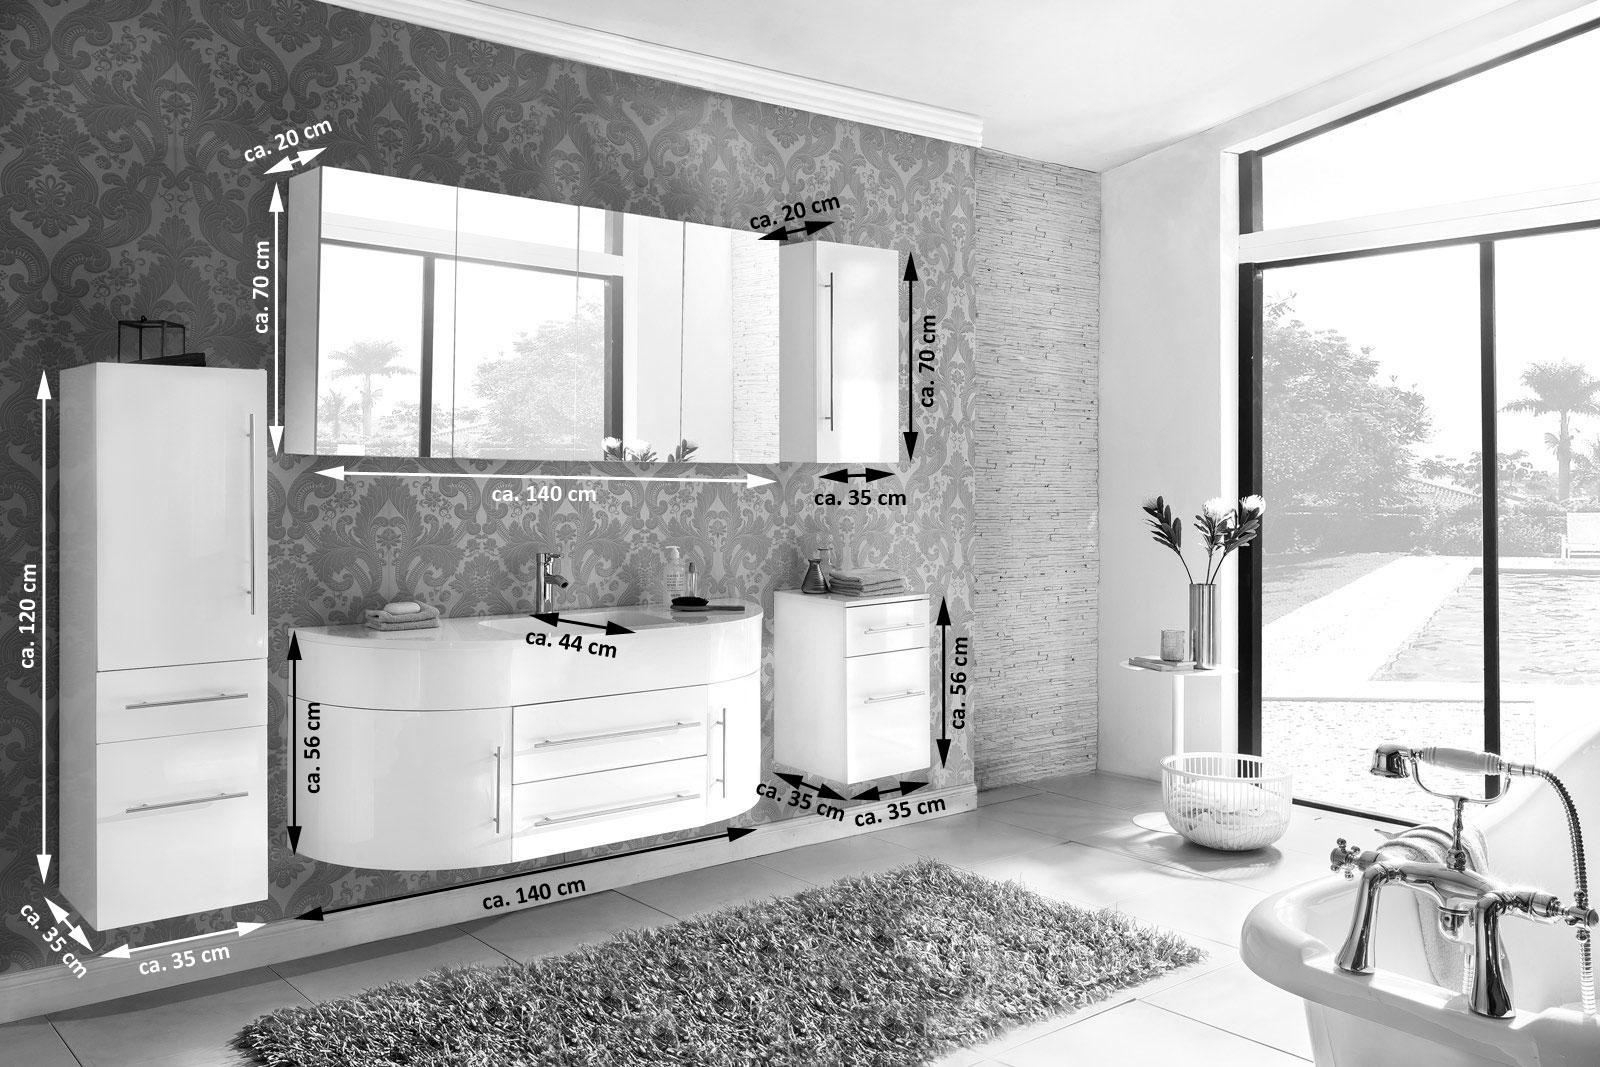 SAM® Badmöbel Set 5tlg Waschbecken 140 cm grau weiß Dublin | {Badmöbel weiss grau 69}